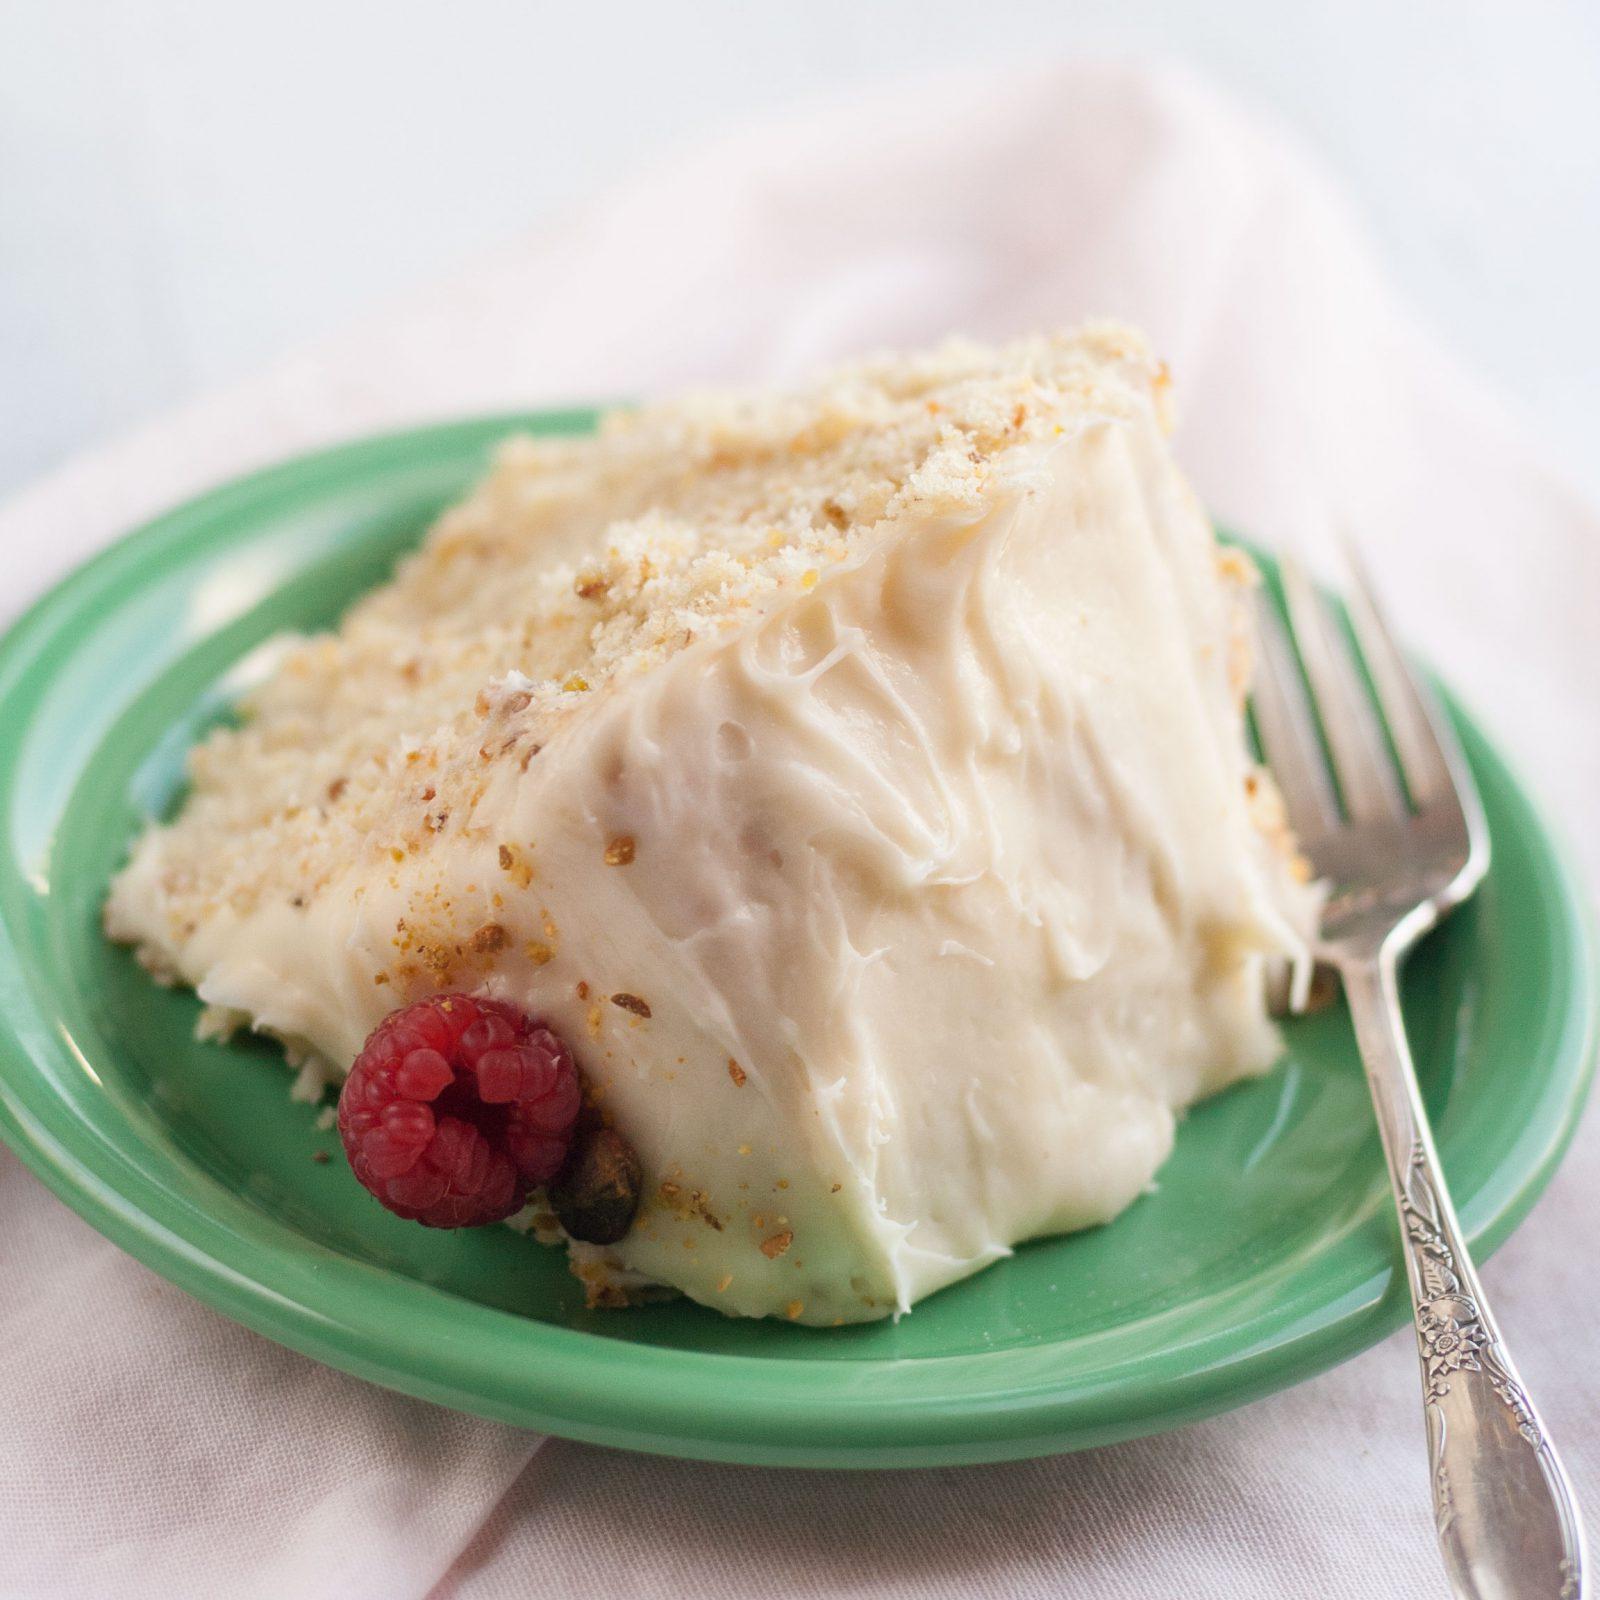 http://blog.fiestafactorydirect.com/wp-content/uploads/2019/01/fiesta-dinnerware-meadow-2019-new-color-pistachio-cake-recipe-4